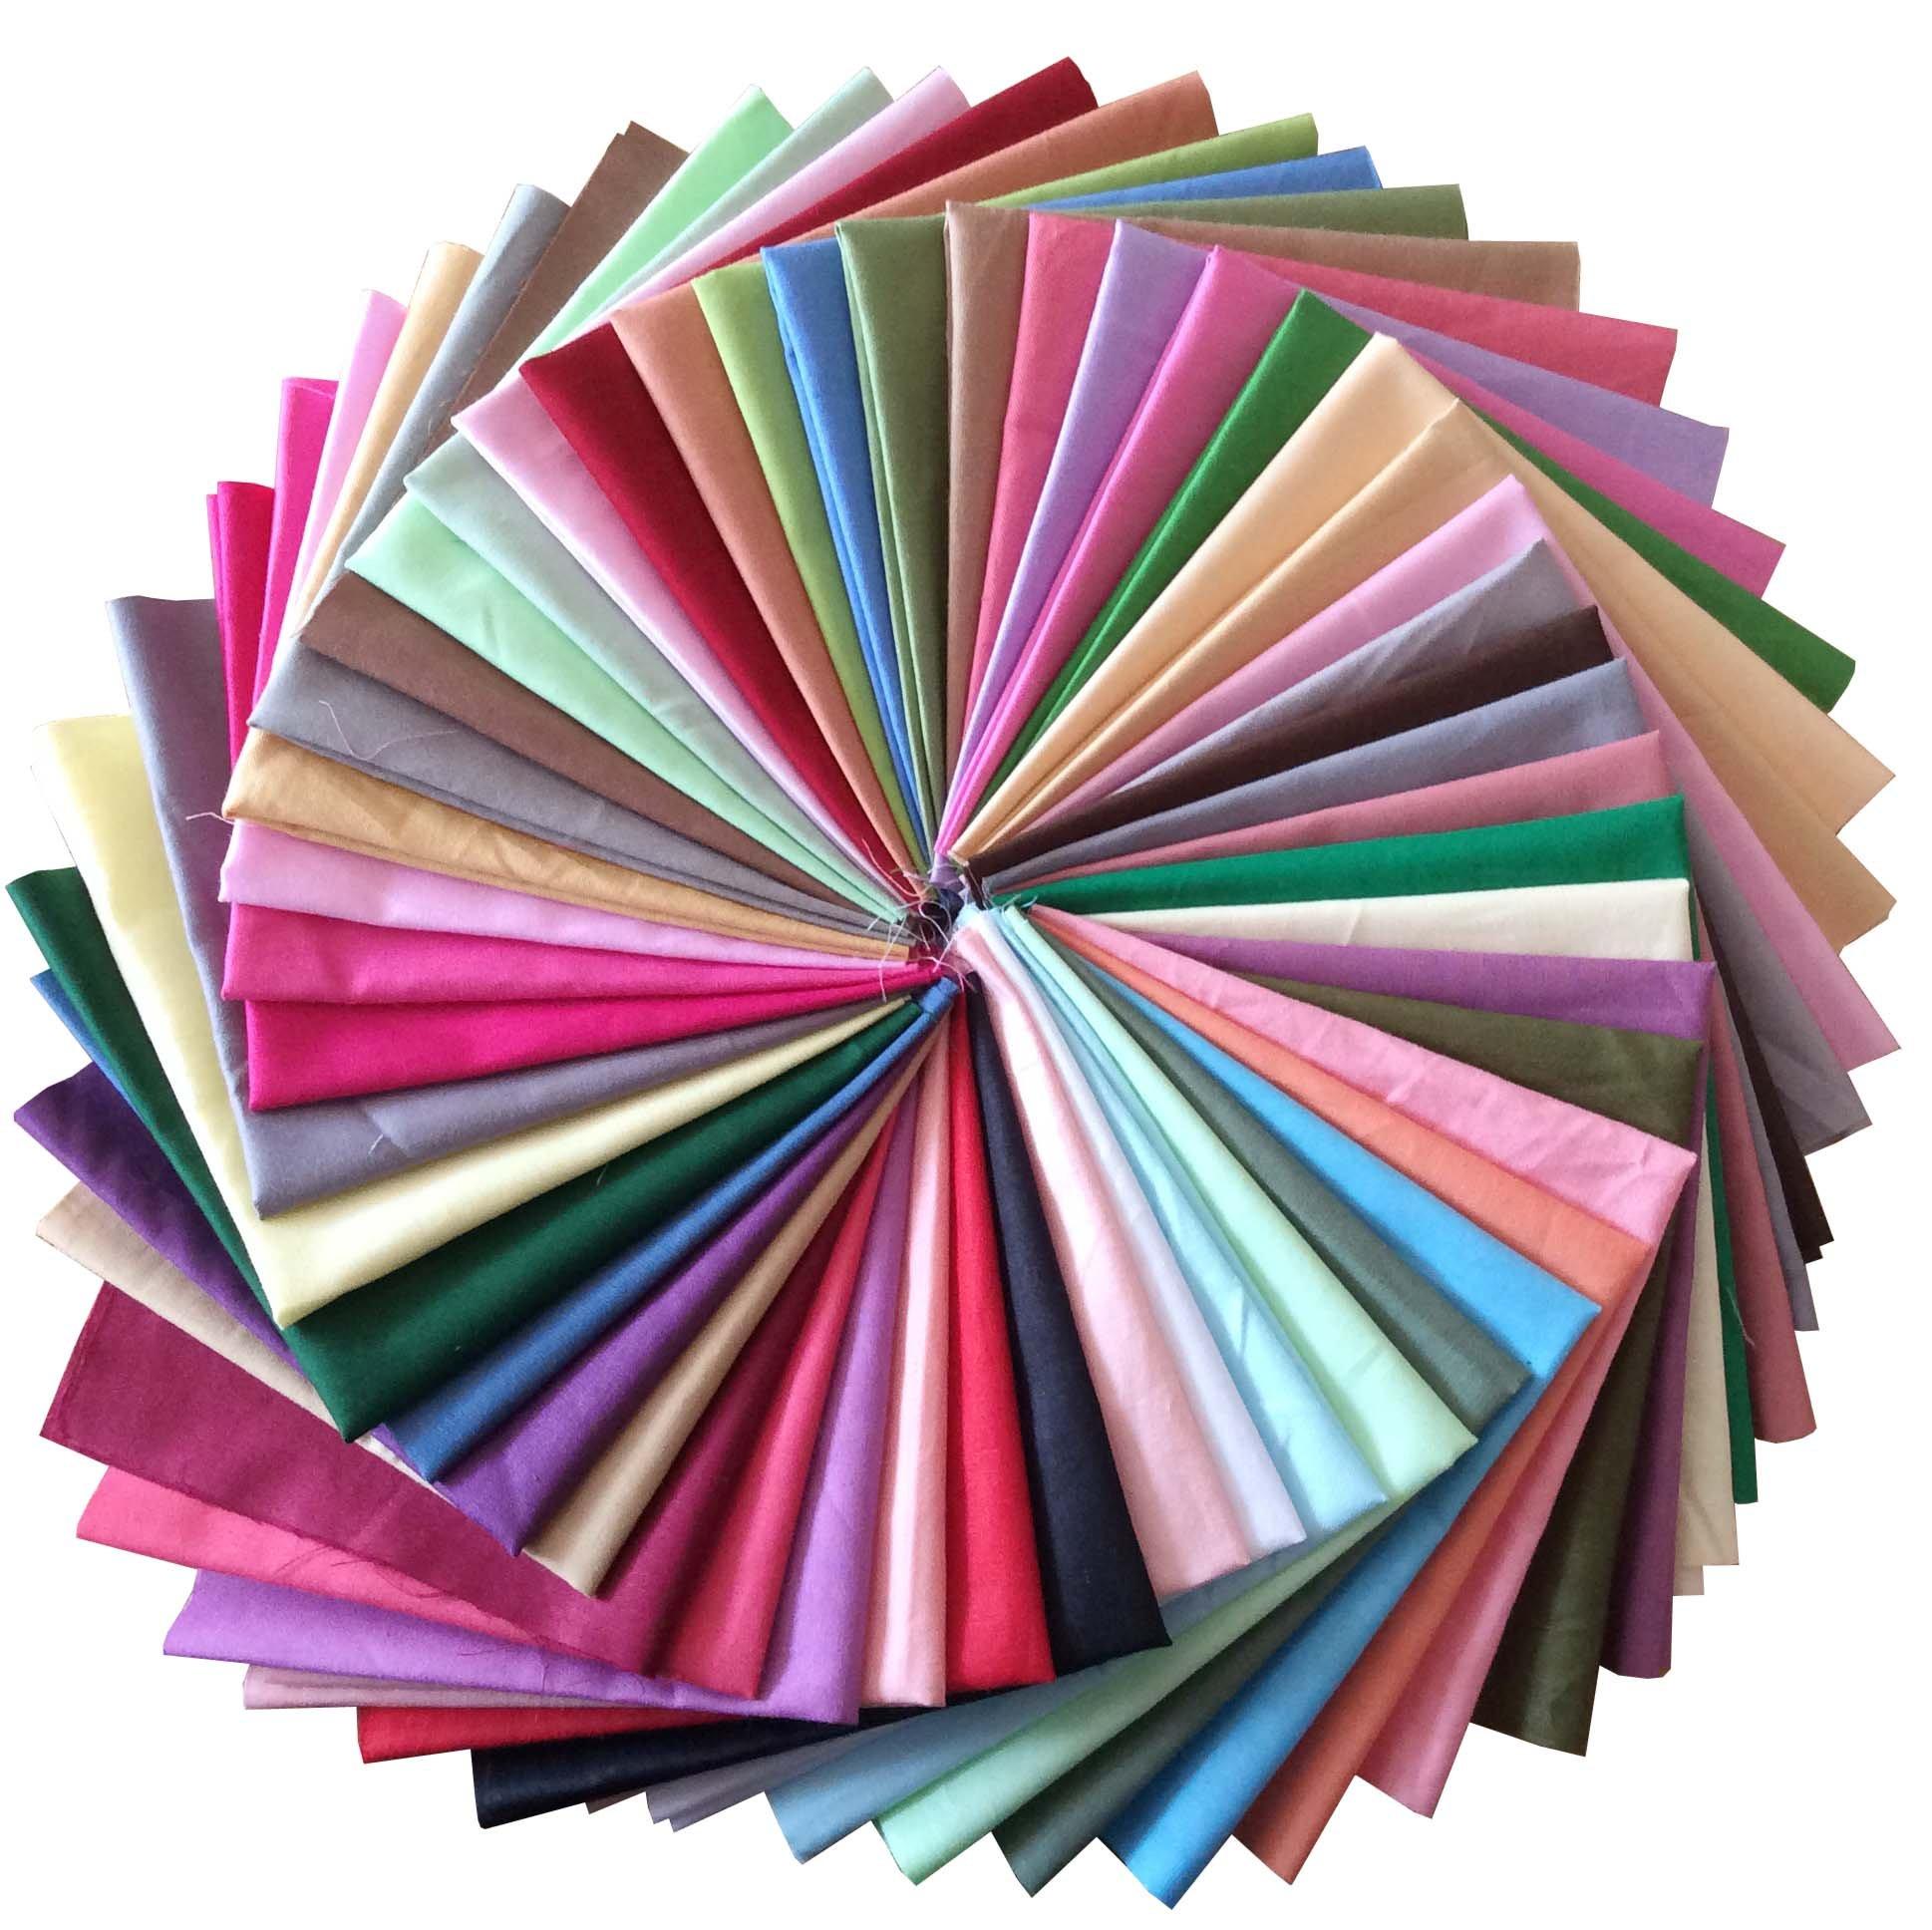 longshine-us 25pcs Solid Colors Premium Cotton Craft Fabric Bundle Squares Patchwork Lint DIY Sewing Scrapbooking Quilting Dot Pattern Artcraft (10'' x 10'') by longshine-us (Image #2)